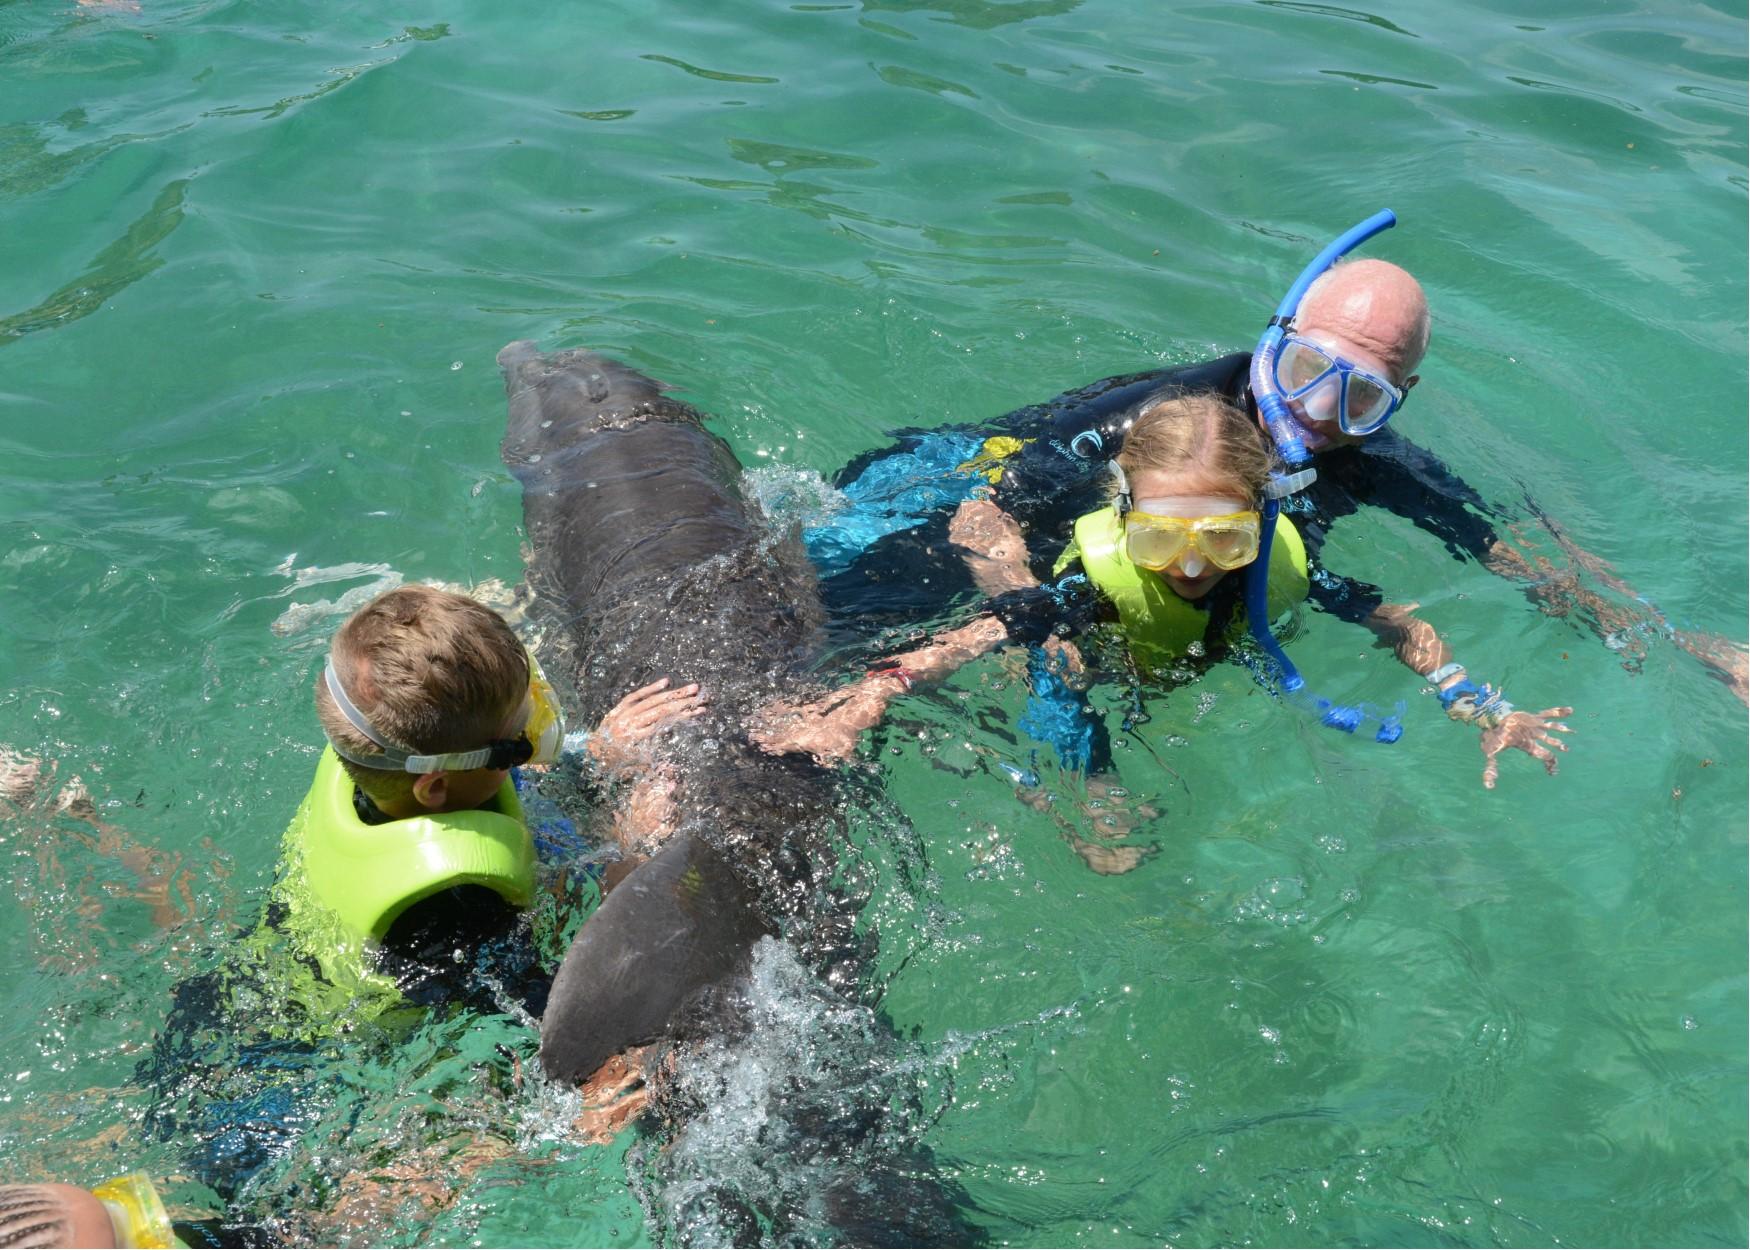 jake hallie pops dolphin play.jpg